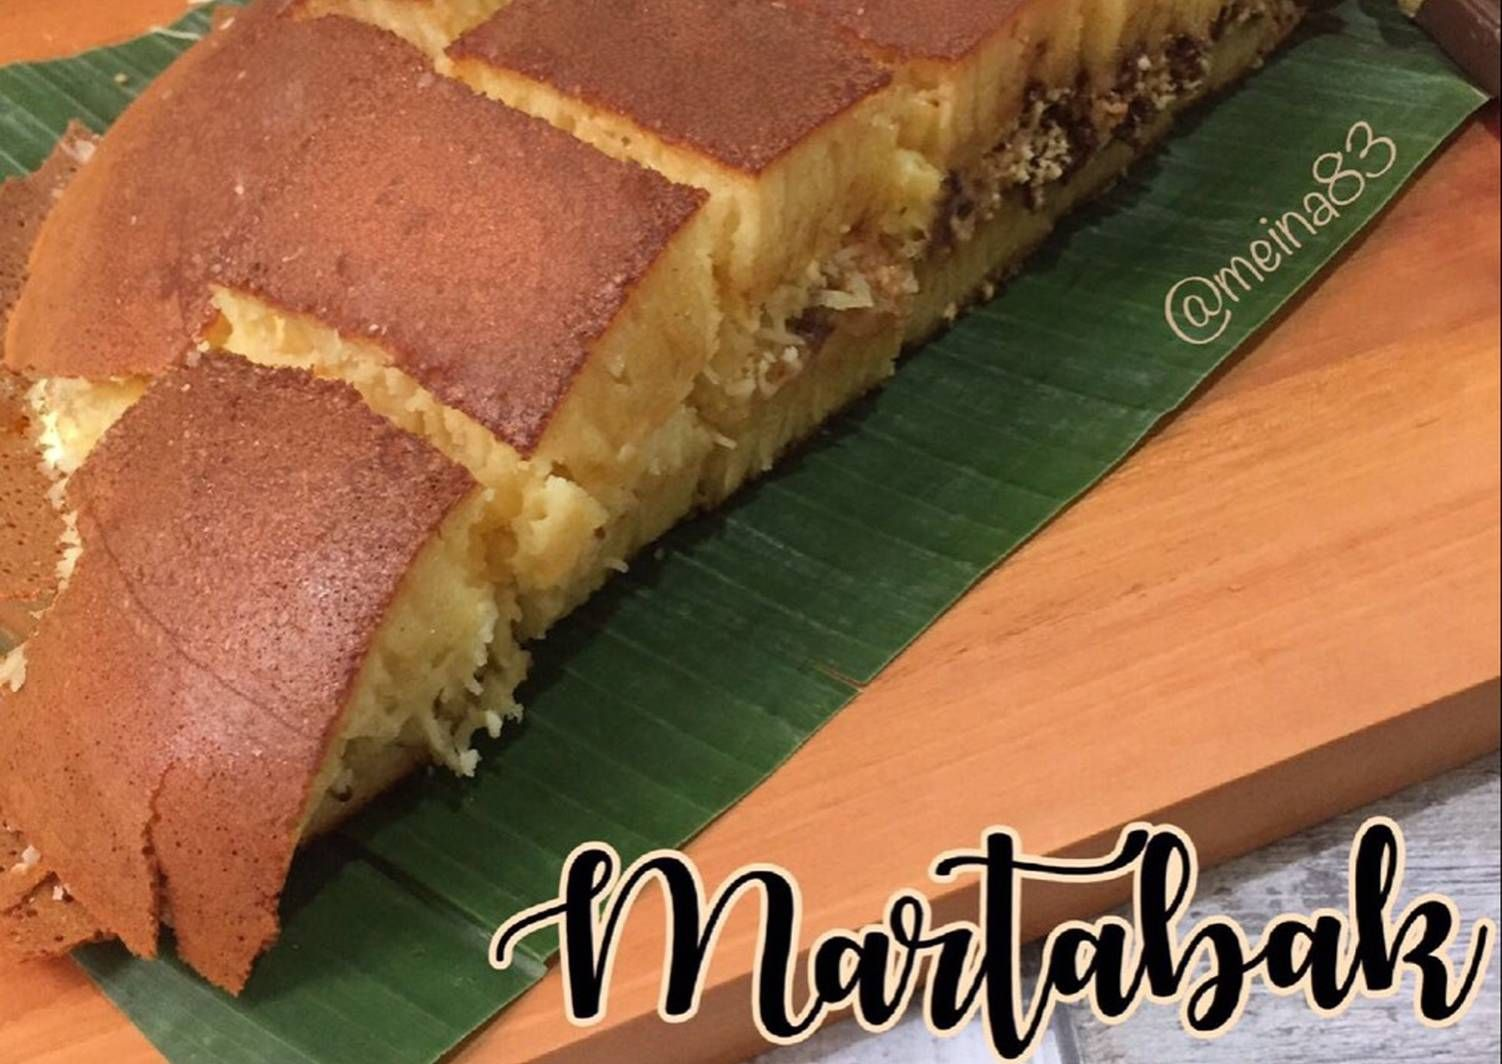 Resep Martabak Manis Oleh Imelda Meina Resep Resep Makanan Manis Resep Masakan